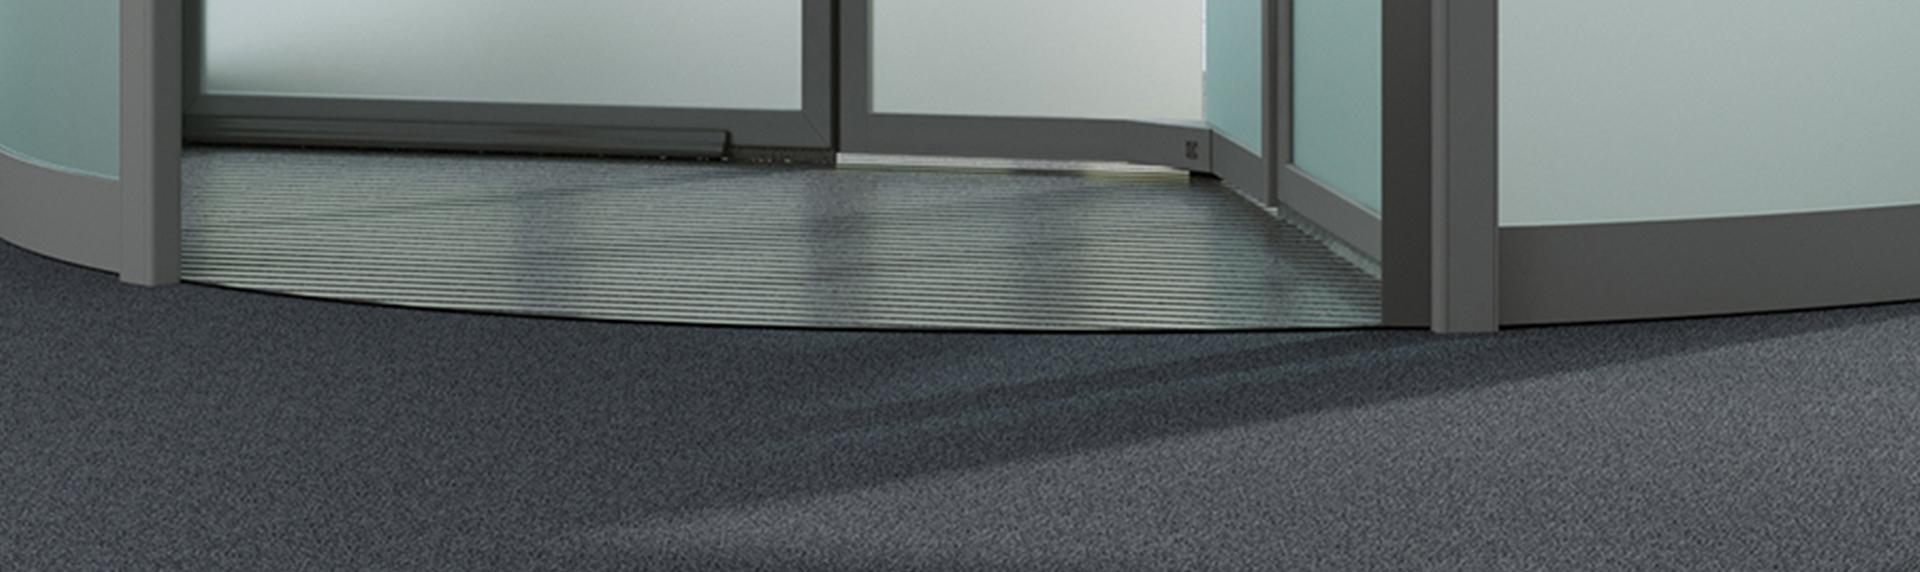 Specialist Entrance Matting - Entraguard and a Barrier Tile